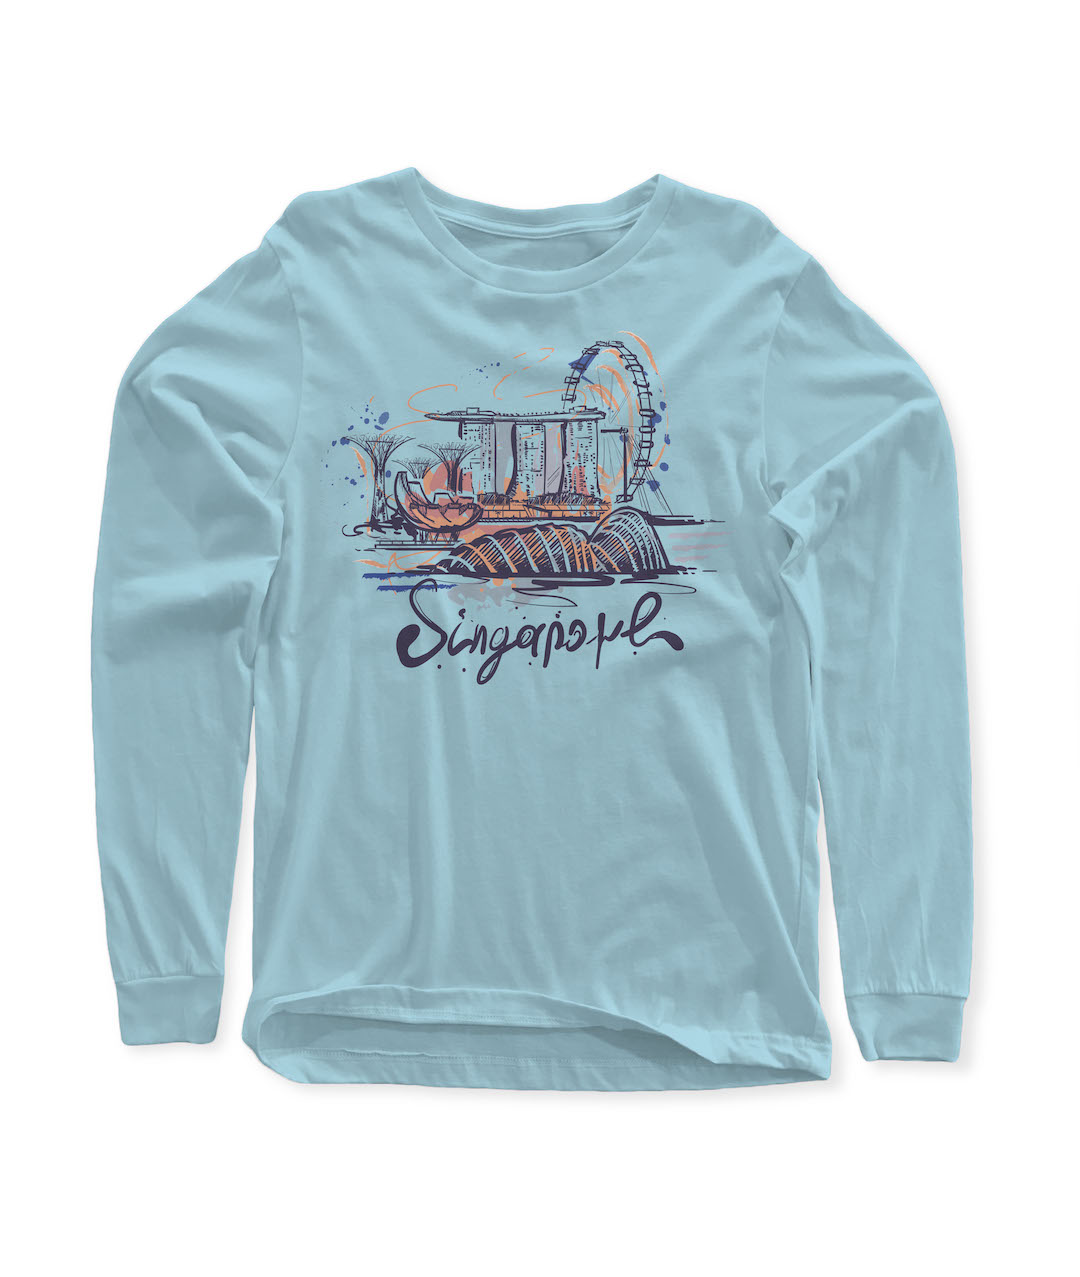 SGB Merchandise T-Shirt 3 Lengan Panjang